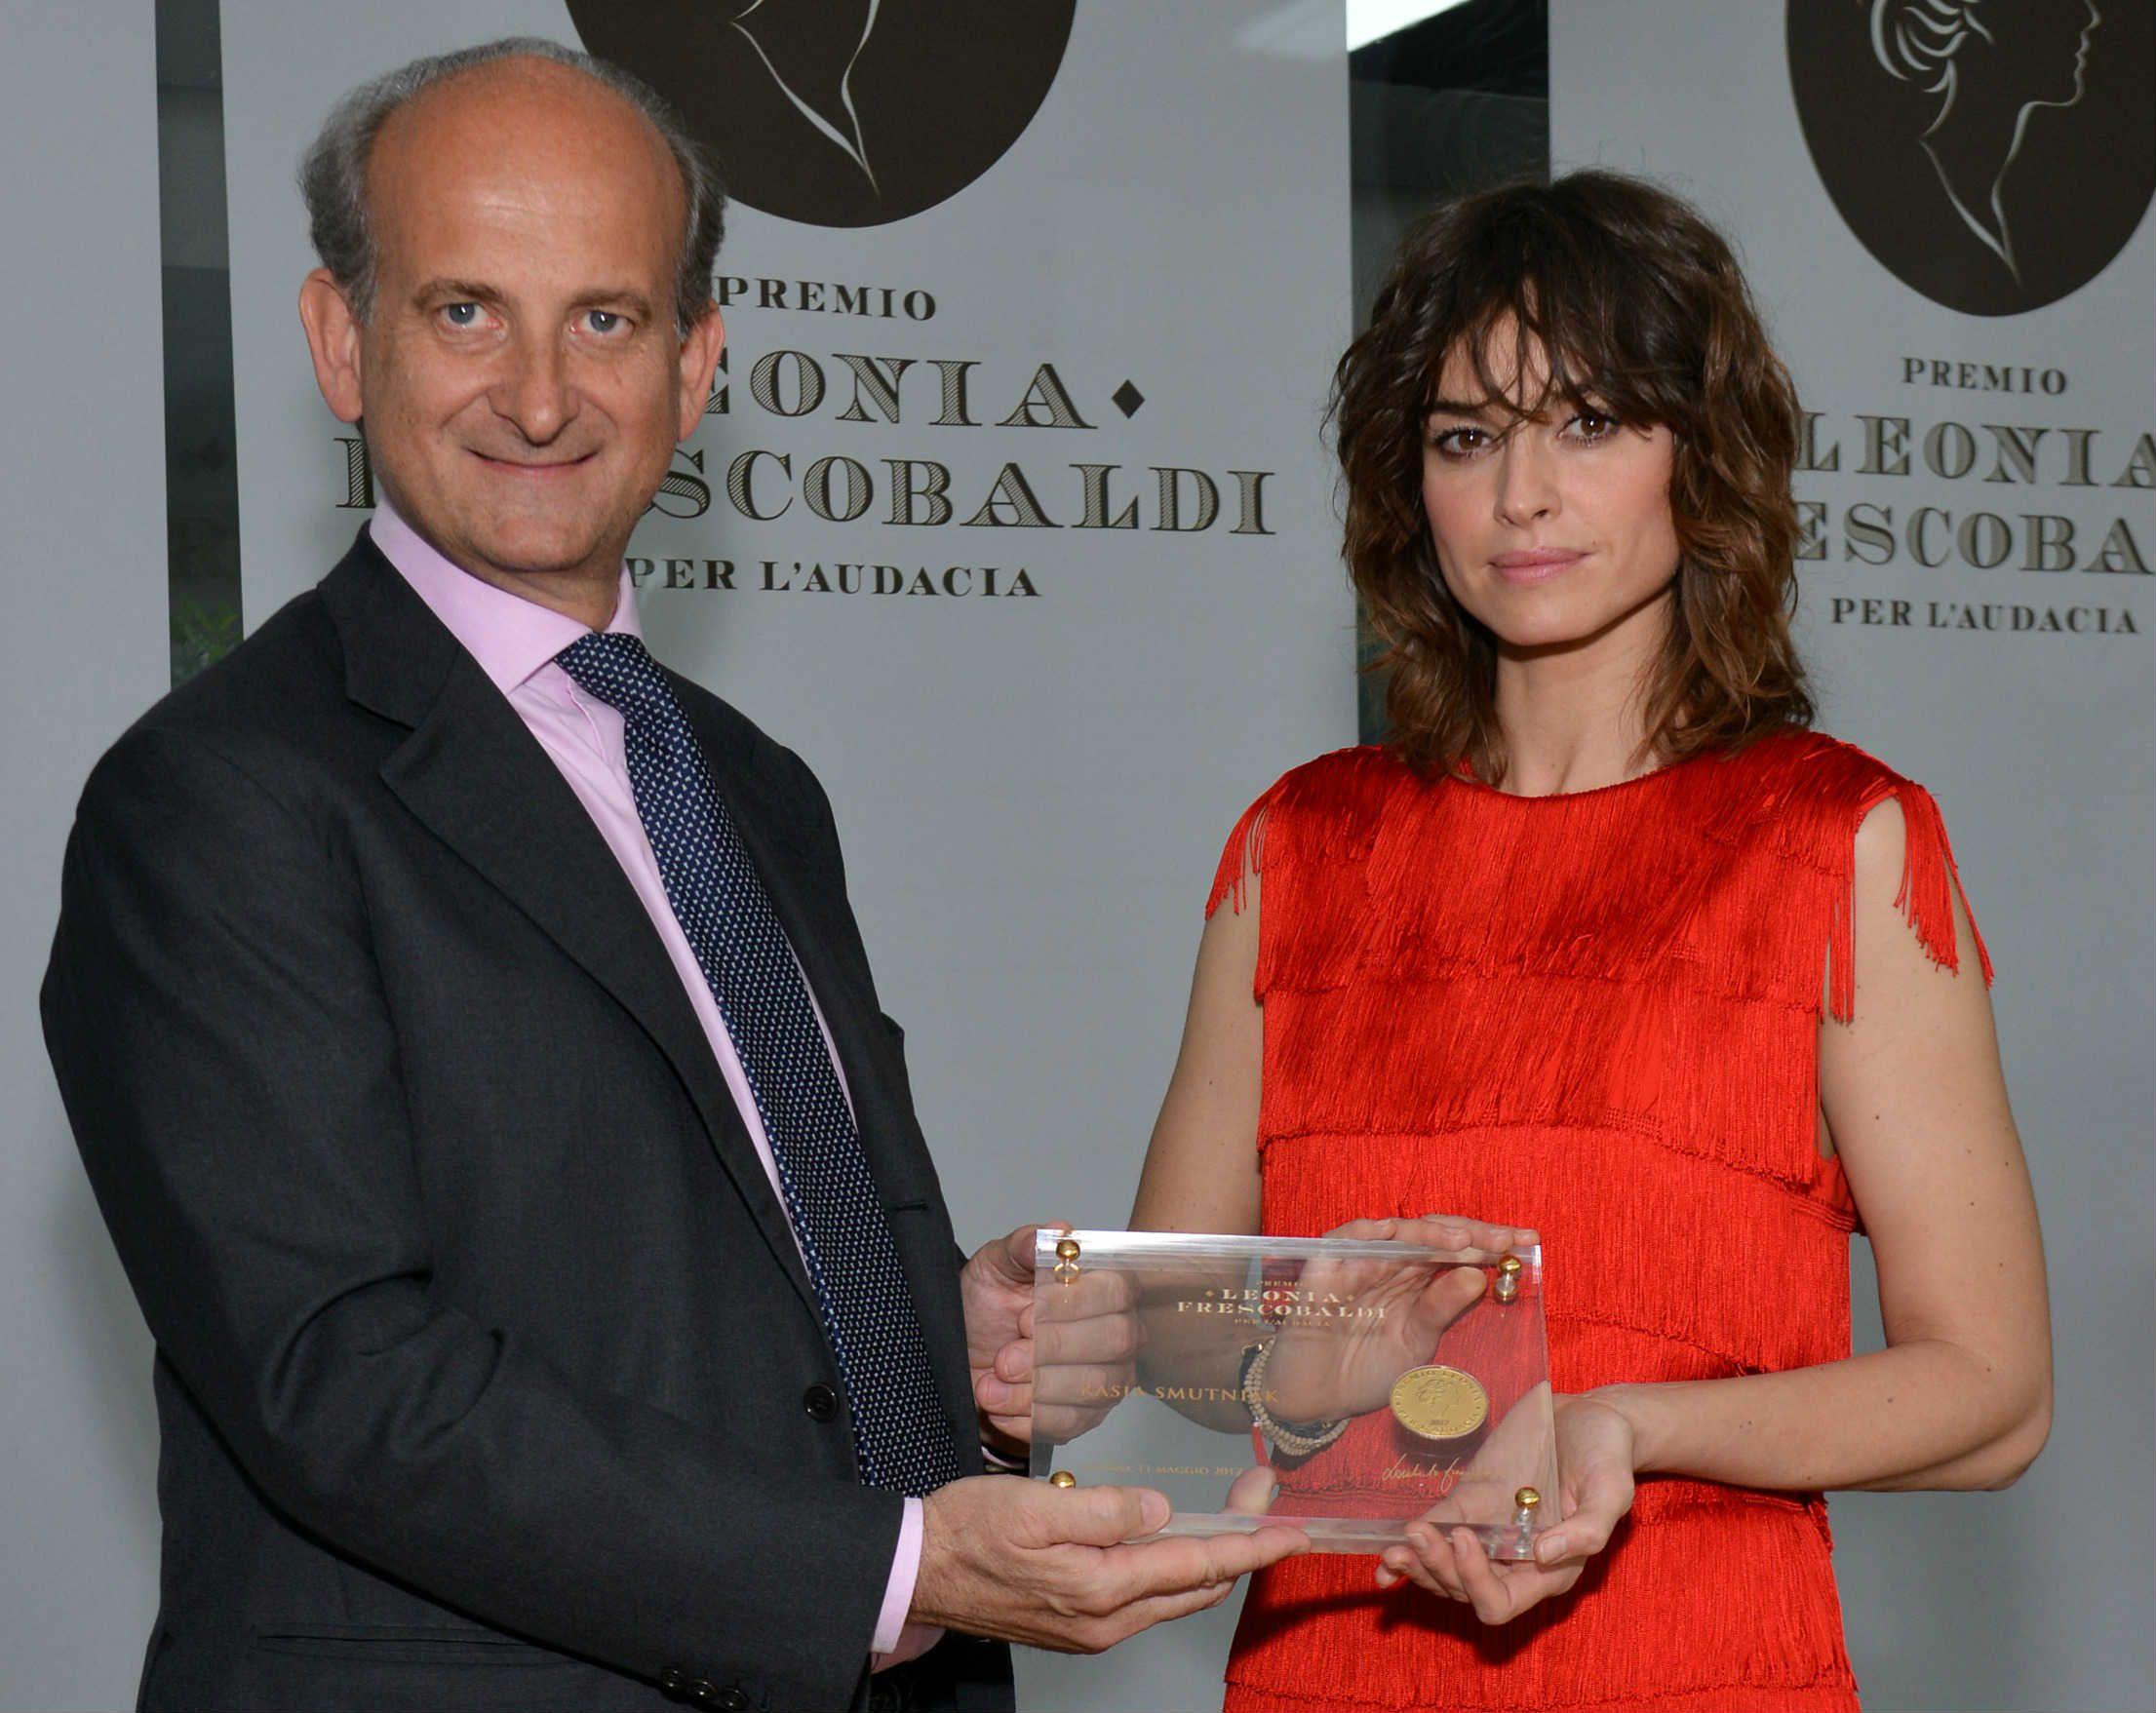 Premio Leonia - Lamberto Frescobaldi e Kasia Smutniak